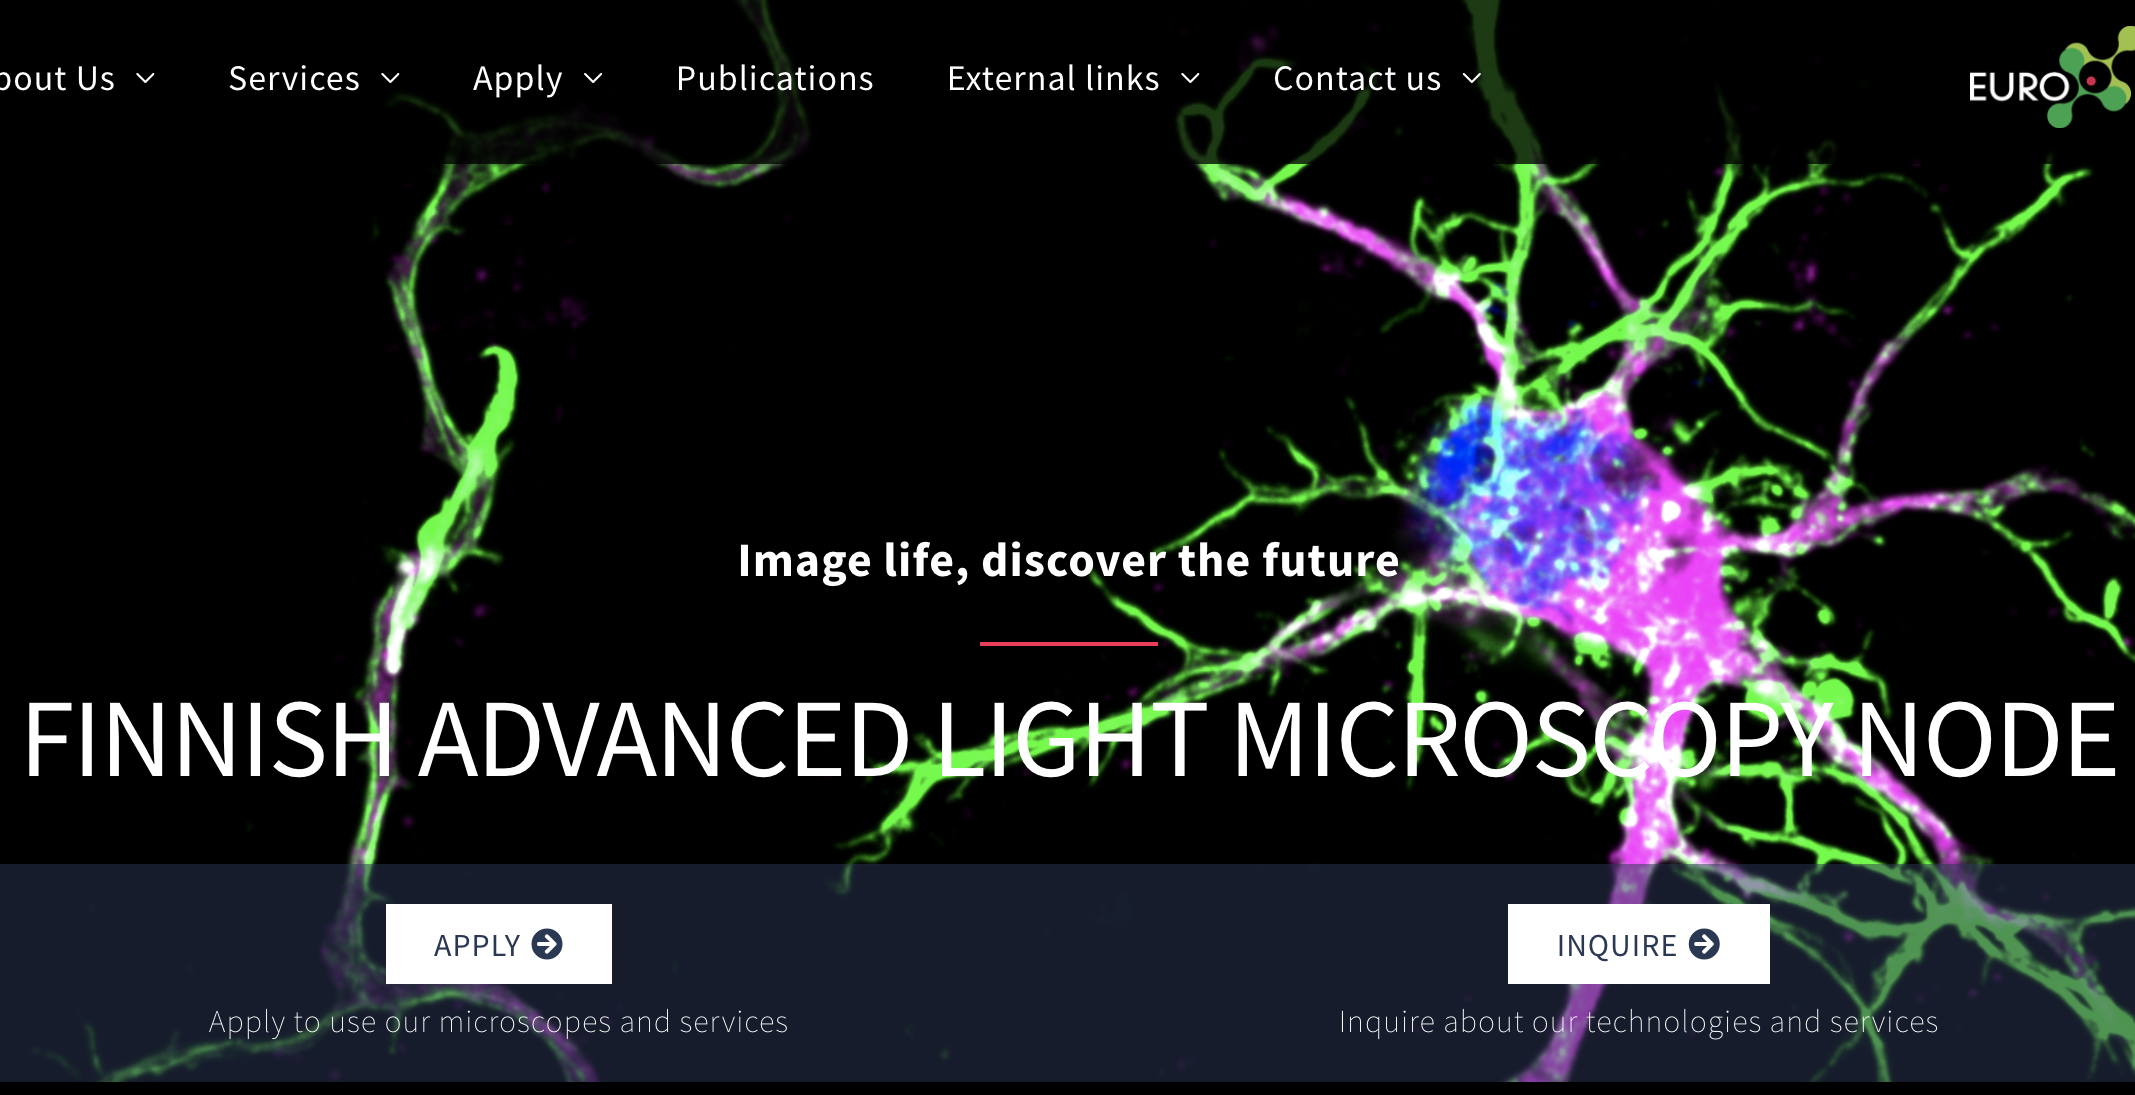 Finnish Advanced Light Microscopy Node, new website